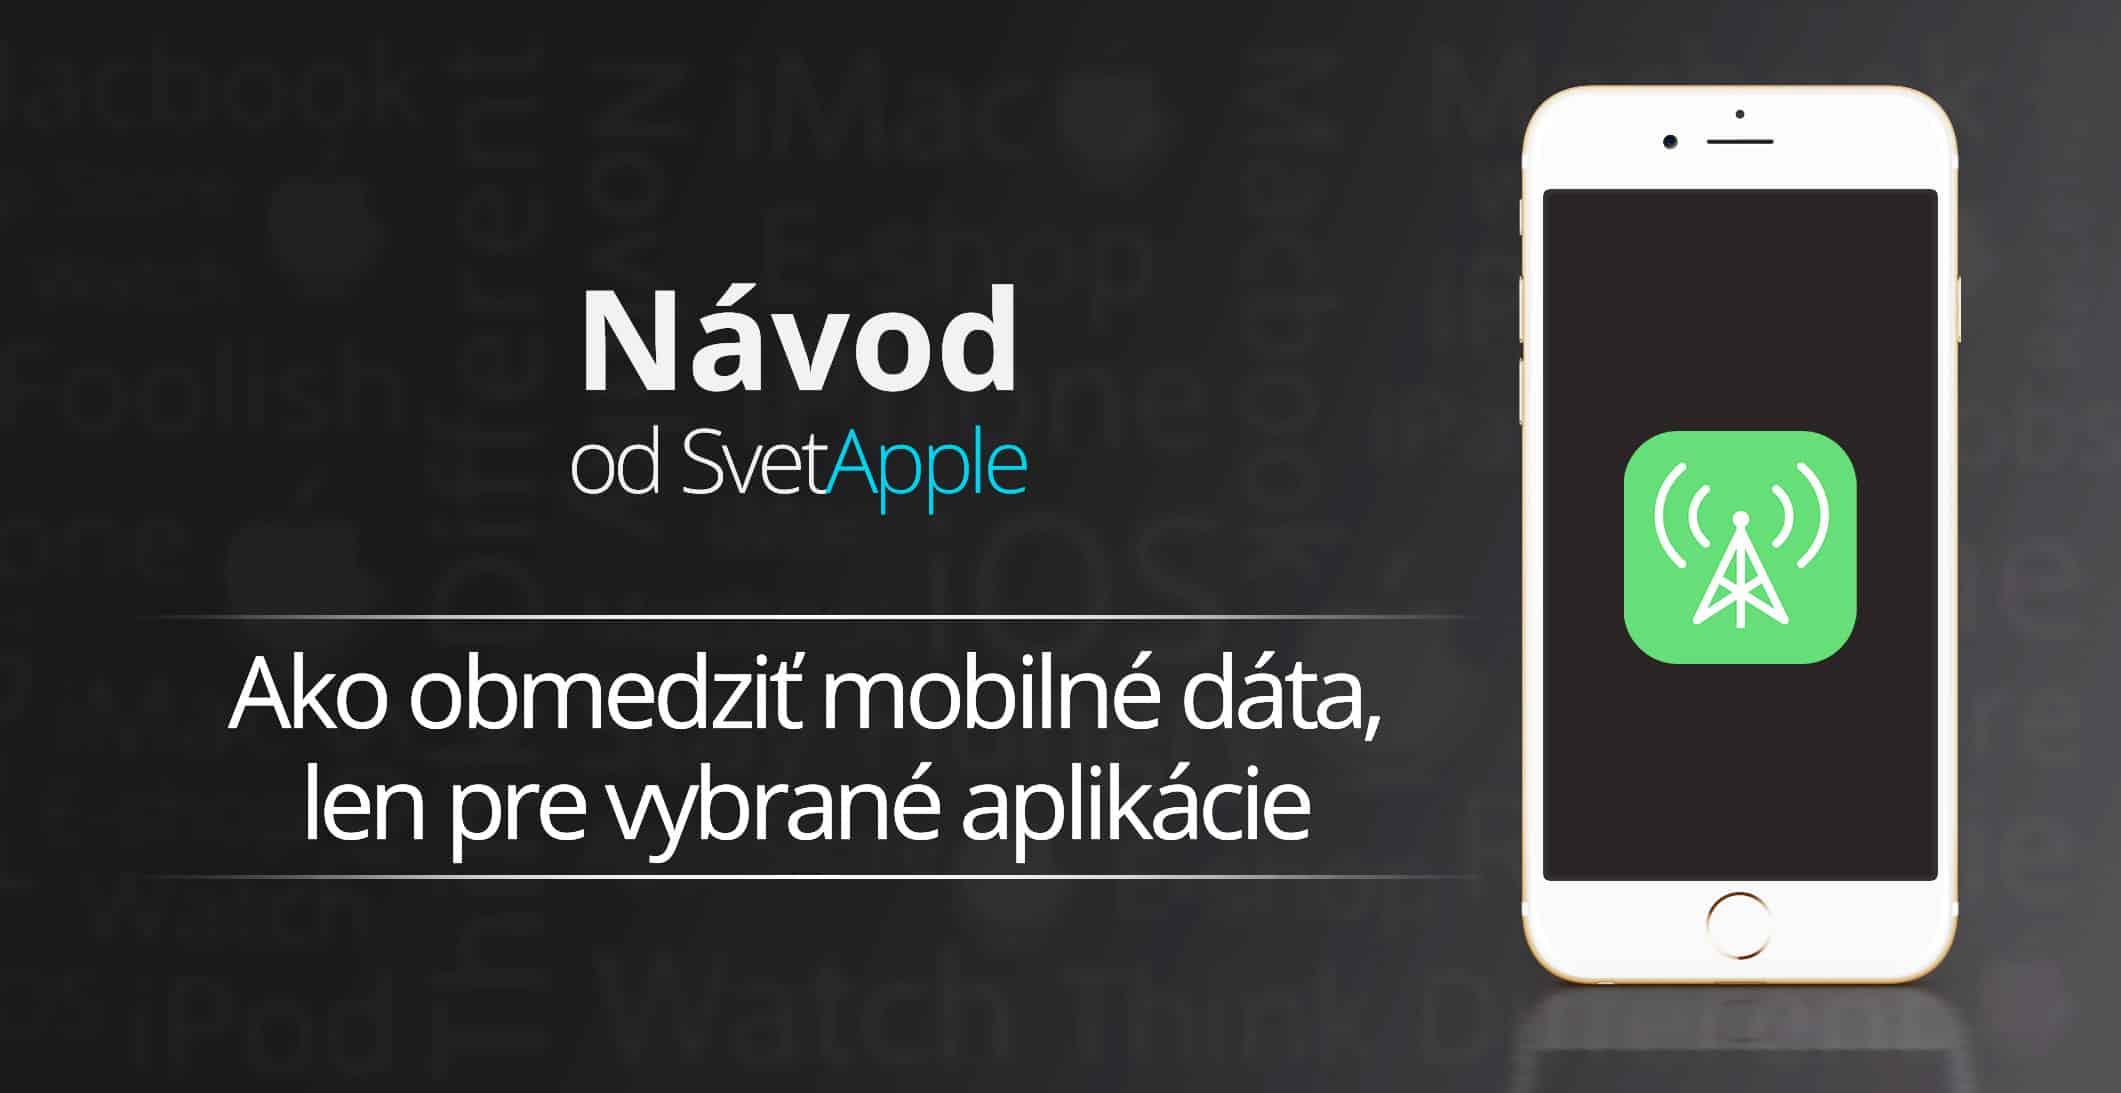 navod-mobilne-datay-iphone-svetapple